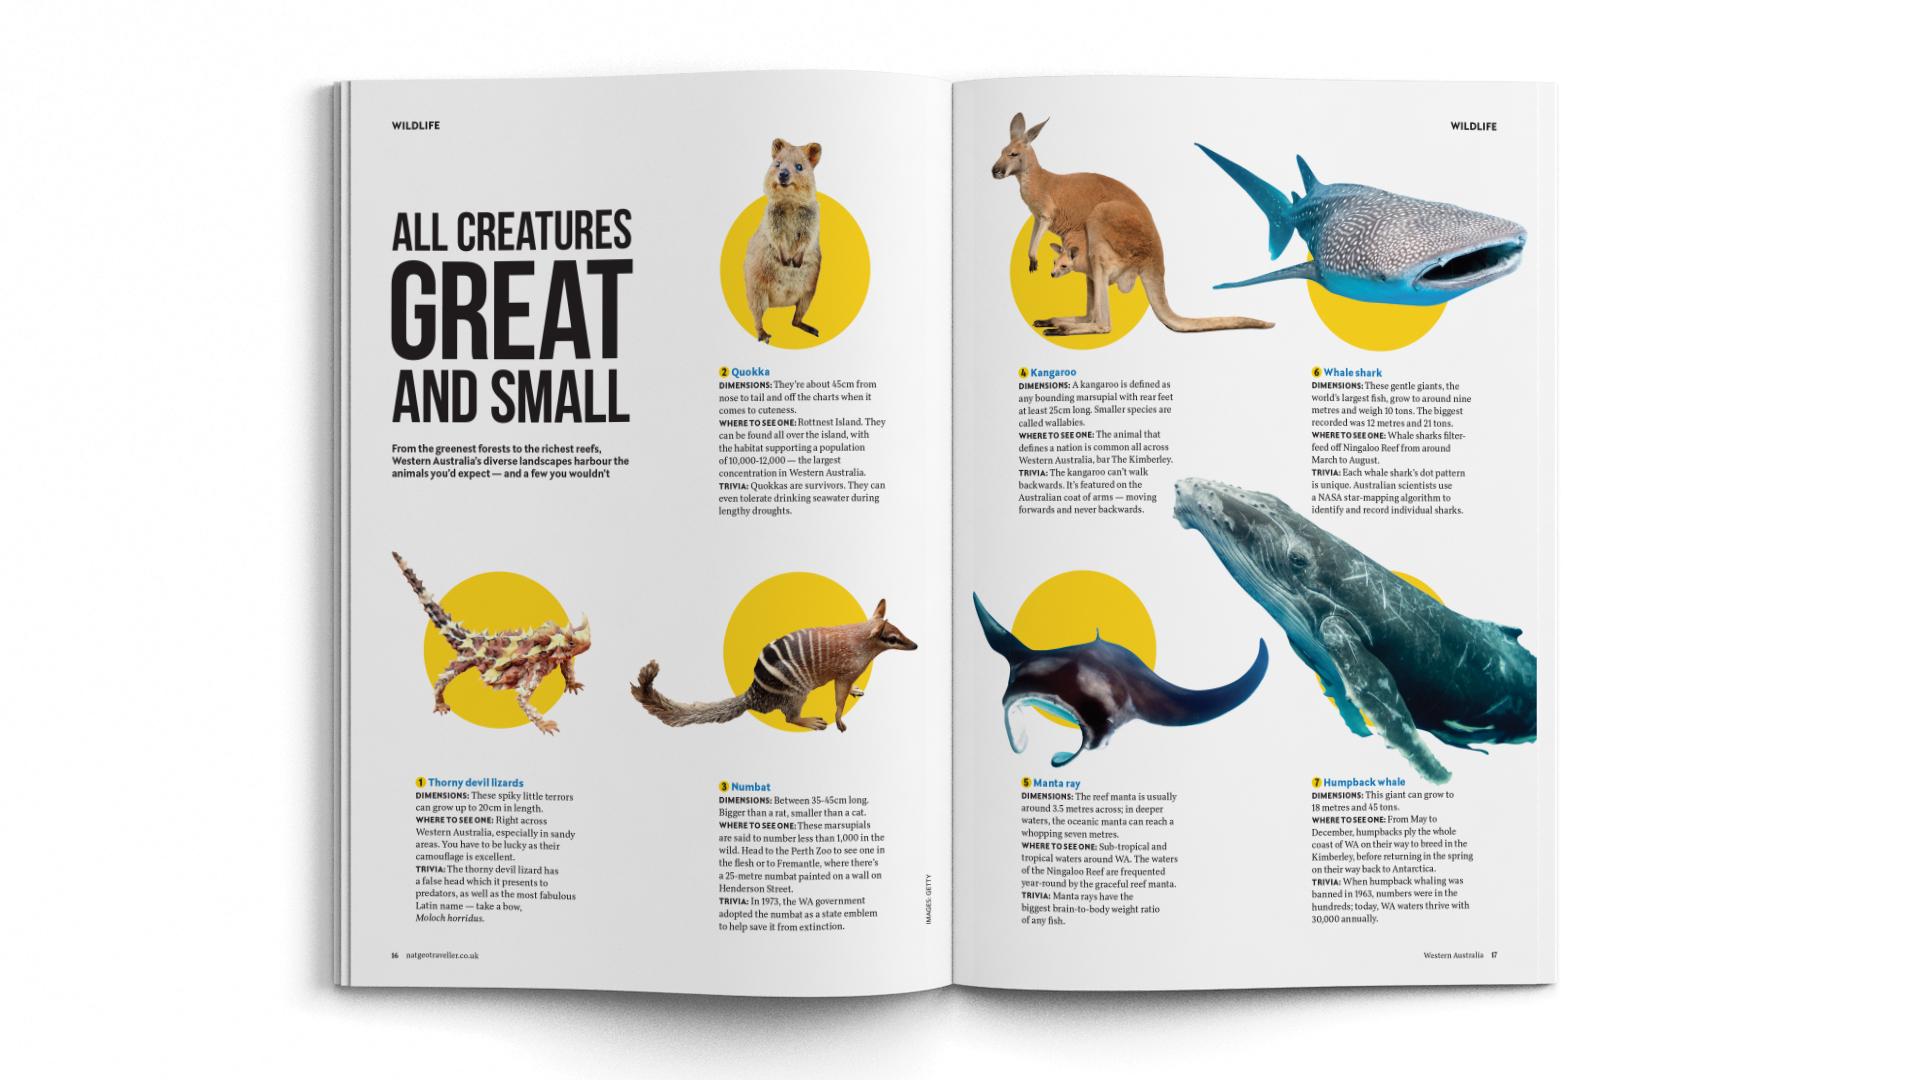 A4-Magazine-DPS-NGT-WA-Creatures